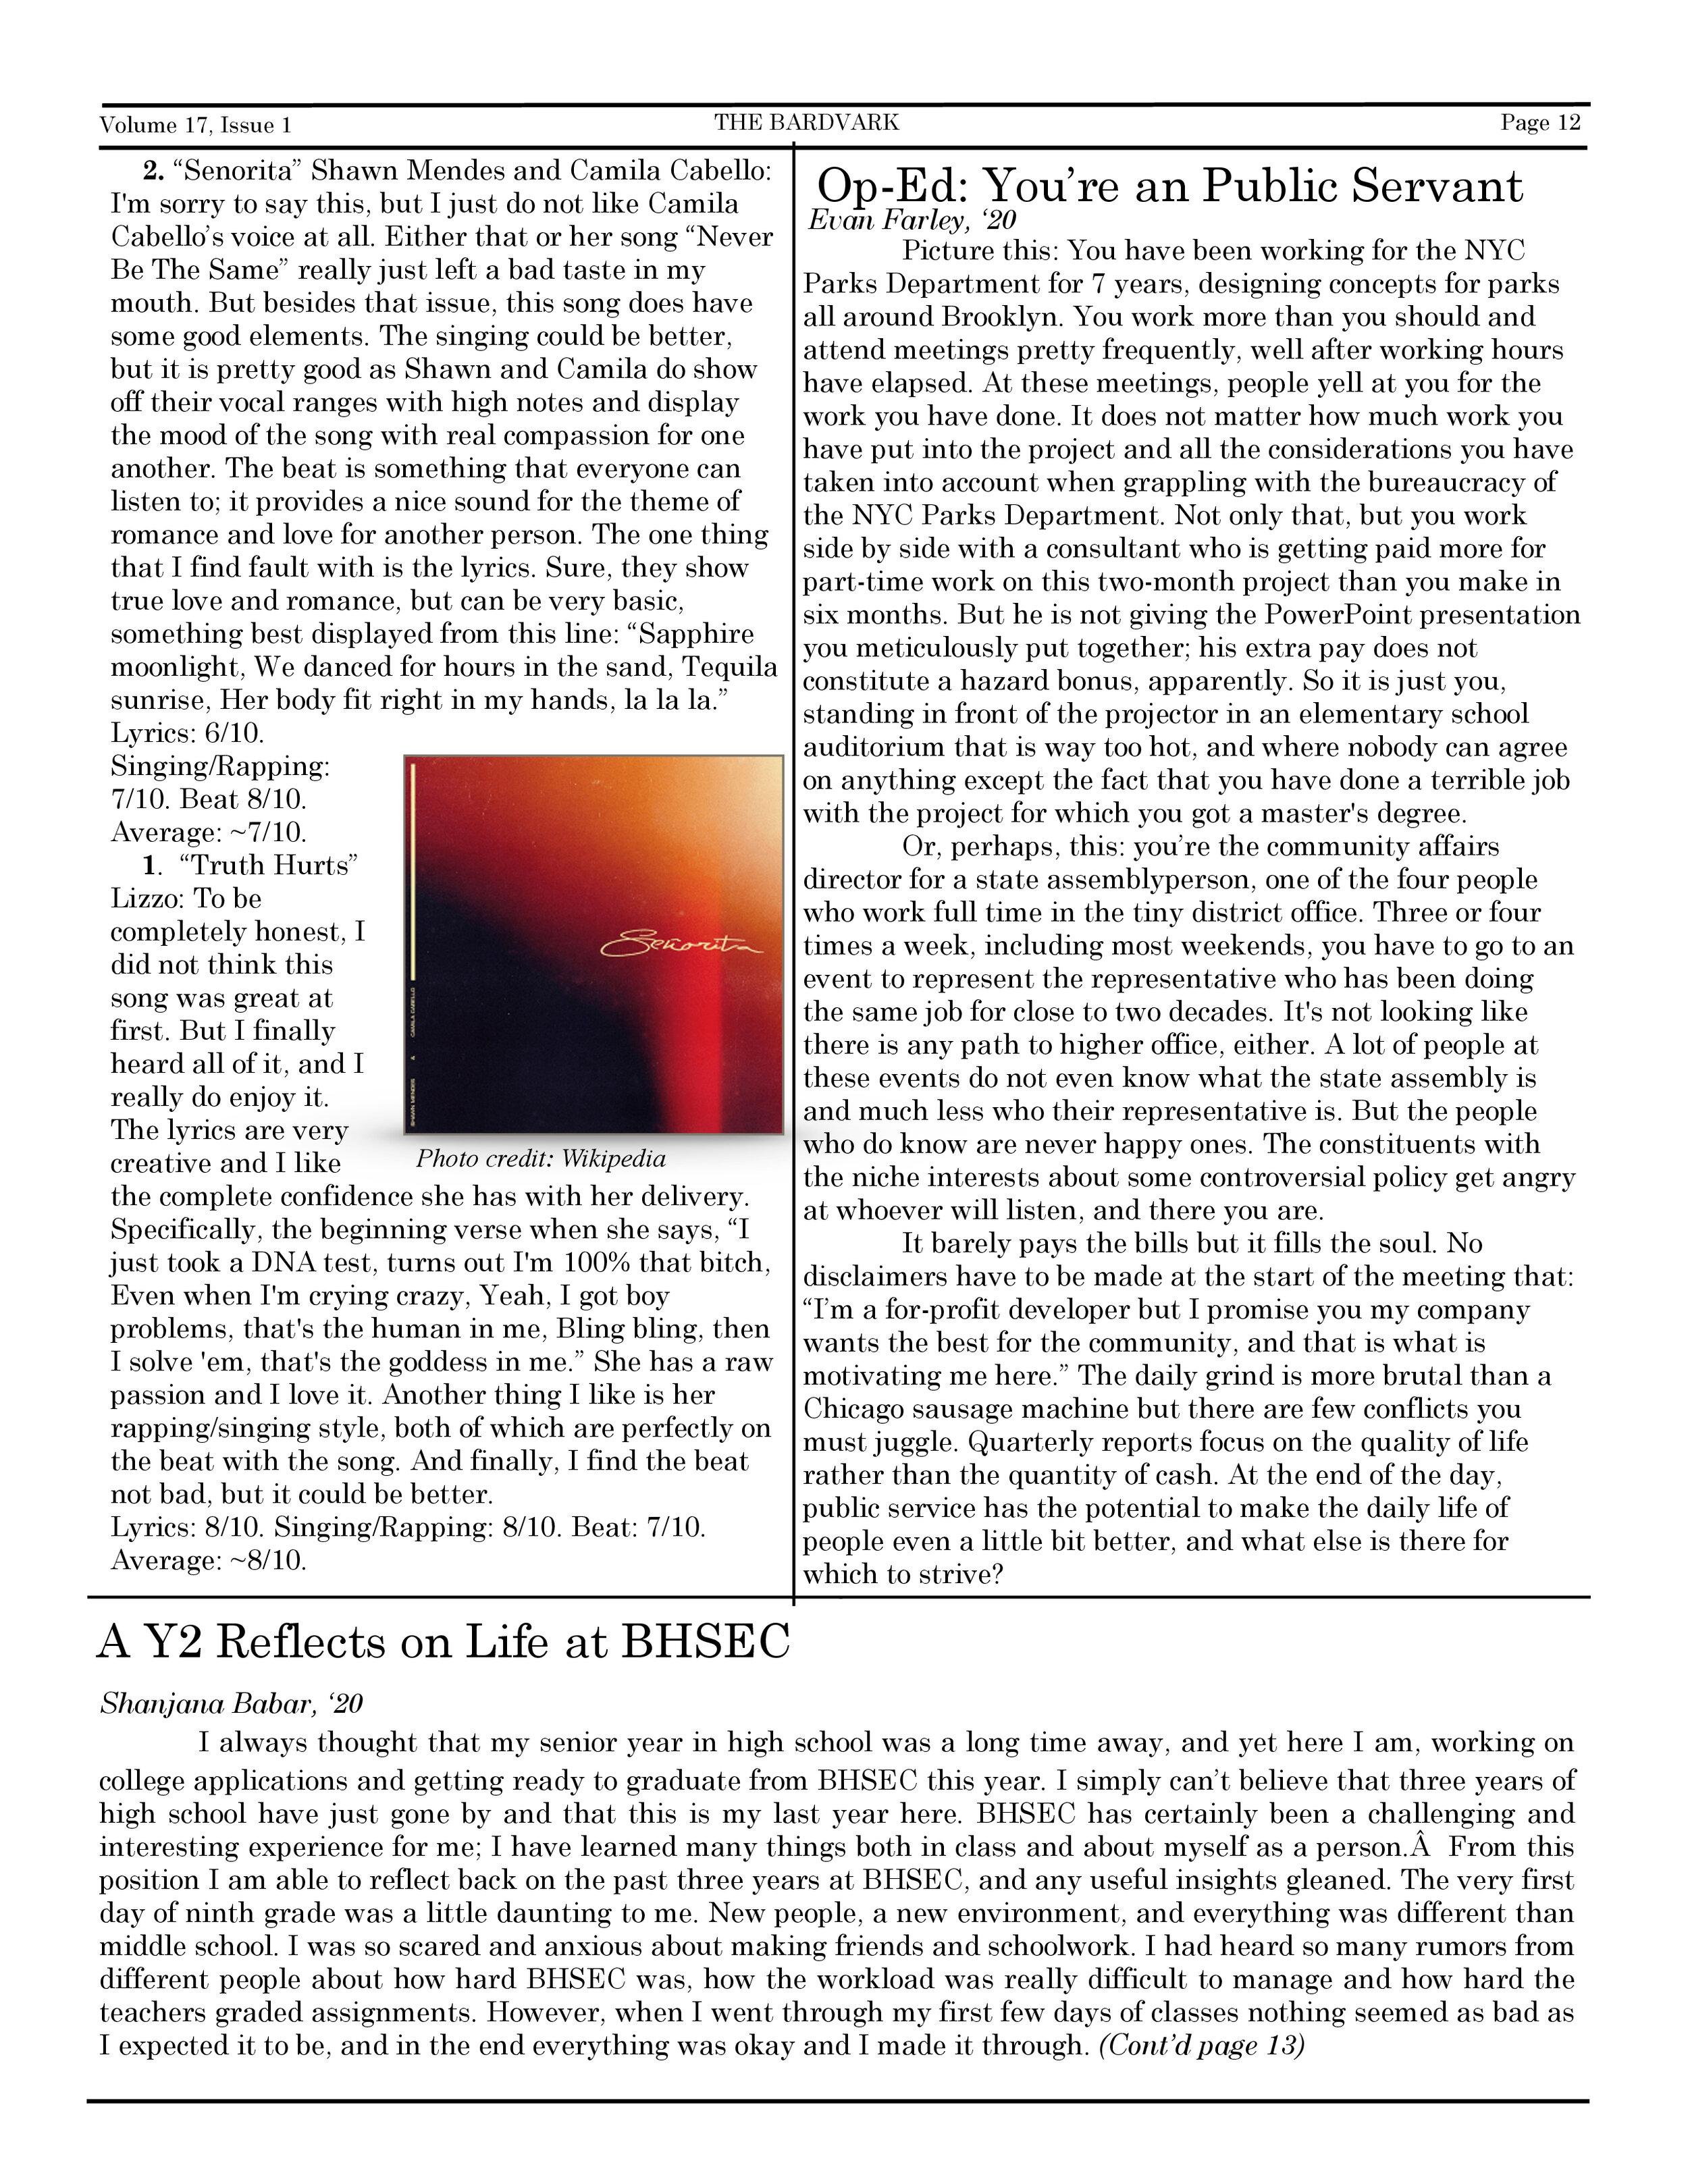 Bardvark Vol 17.1 2-12.jpg